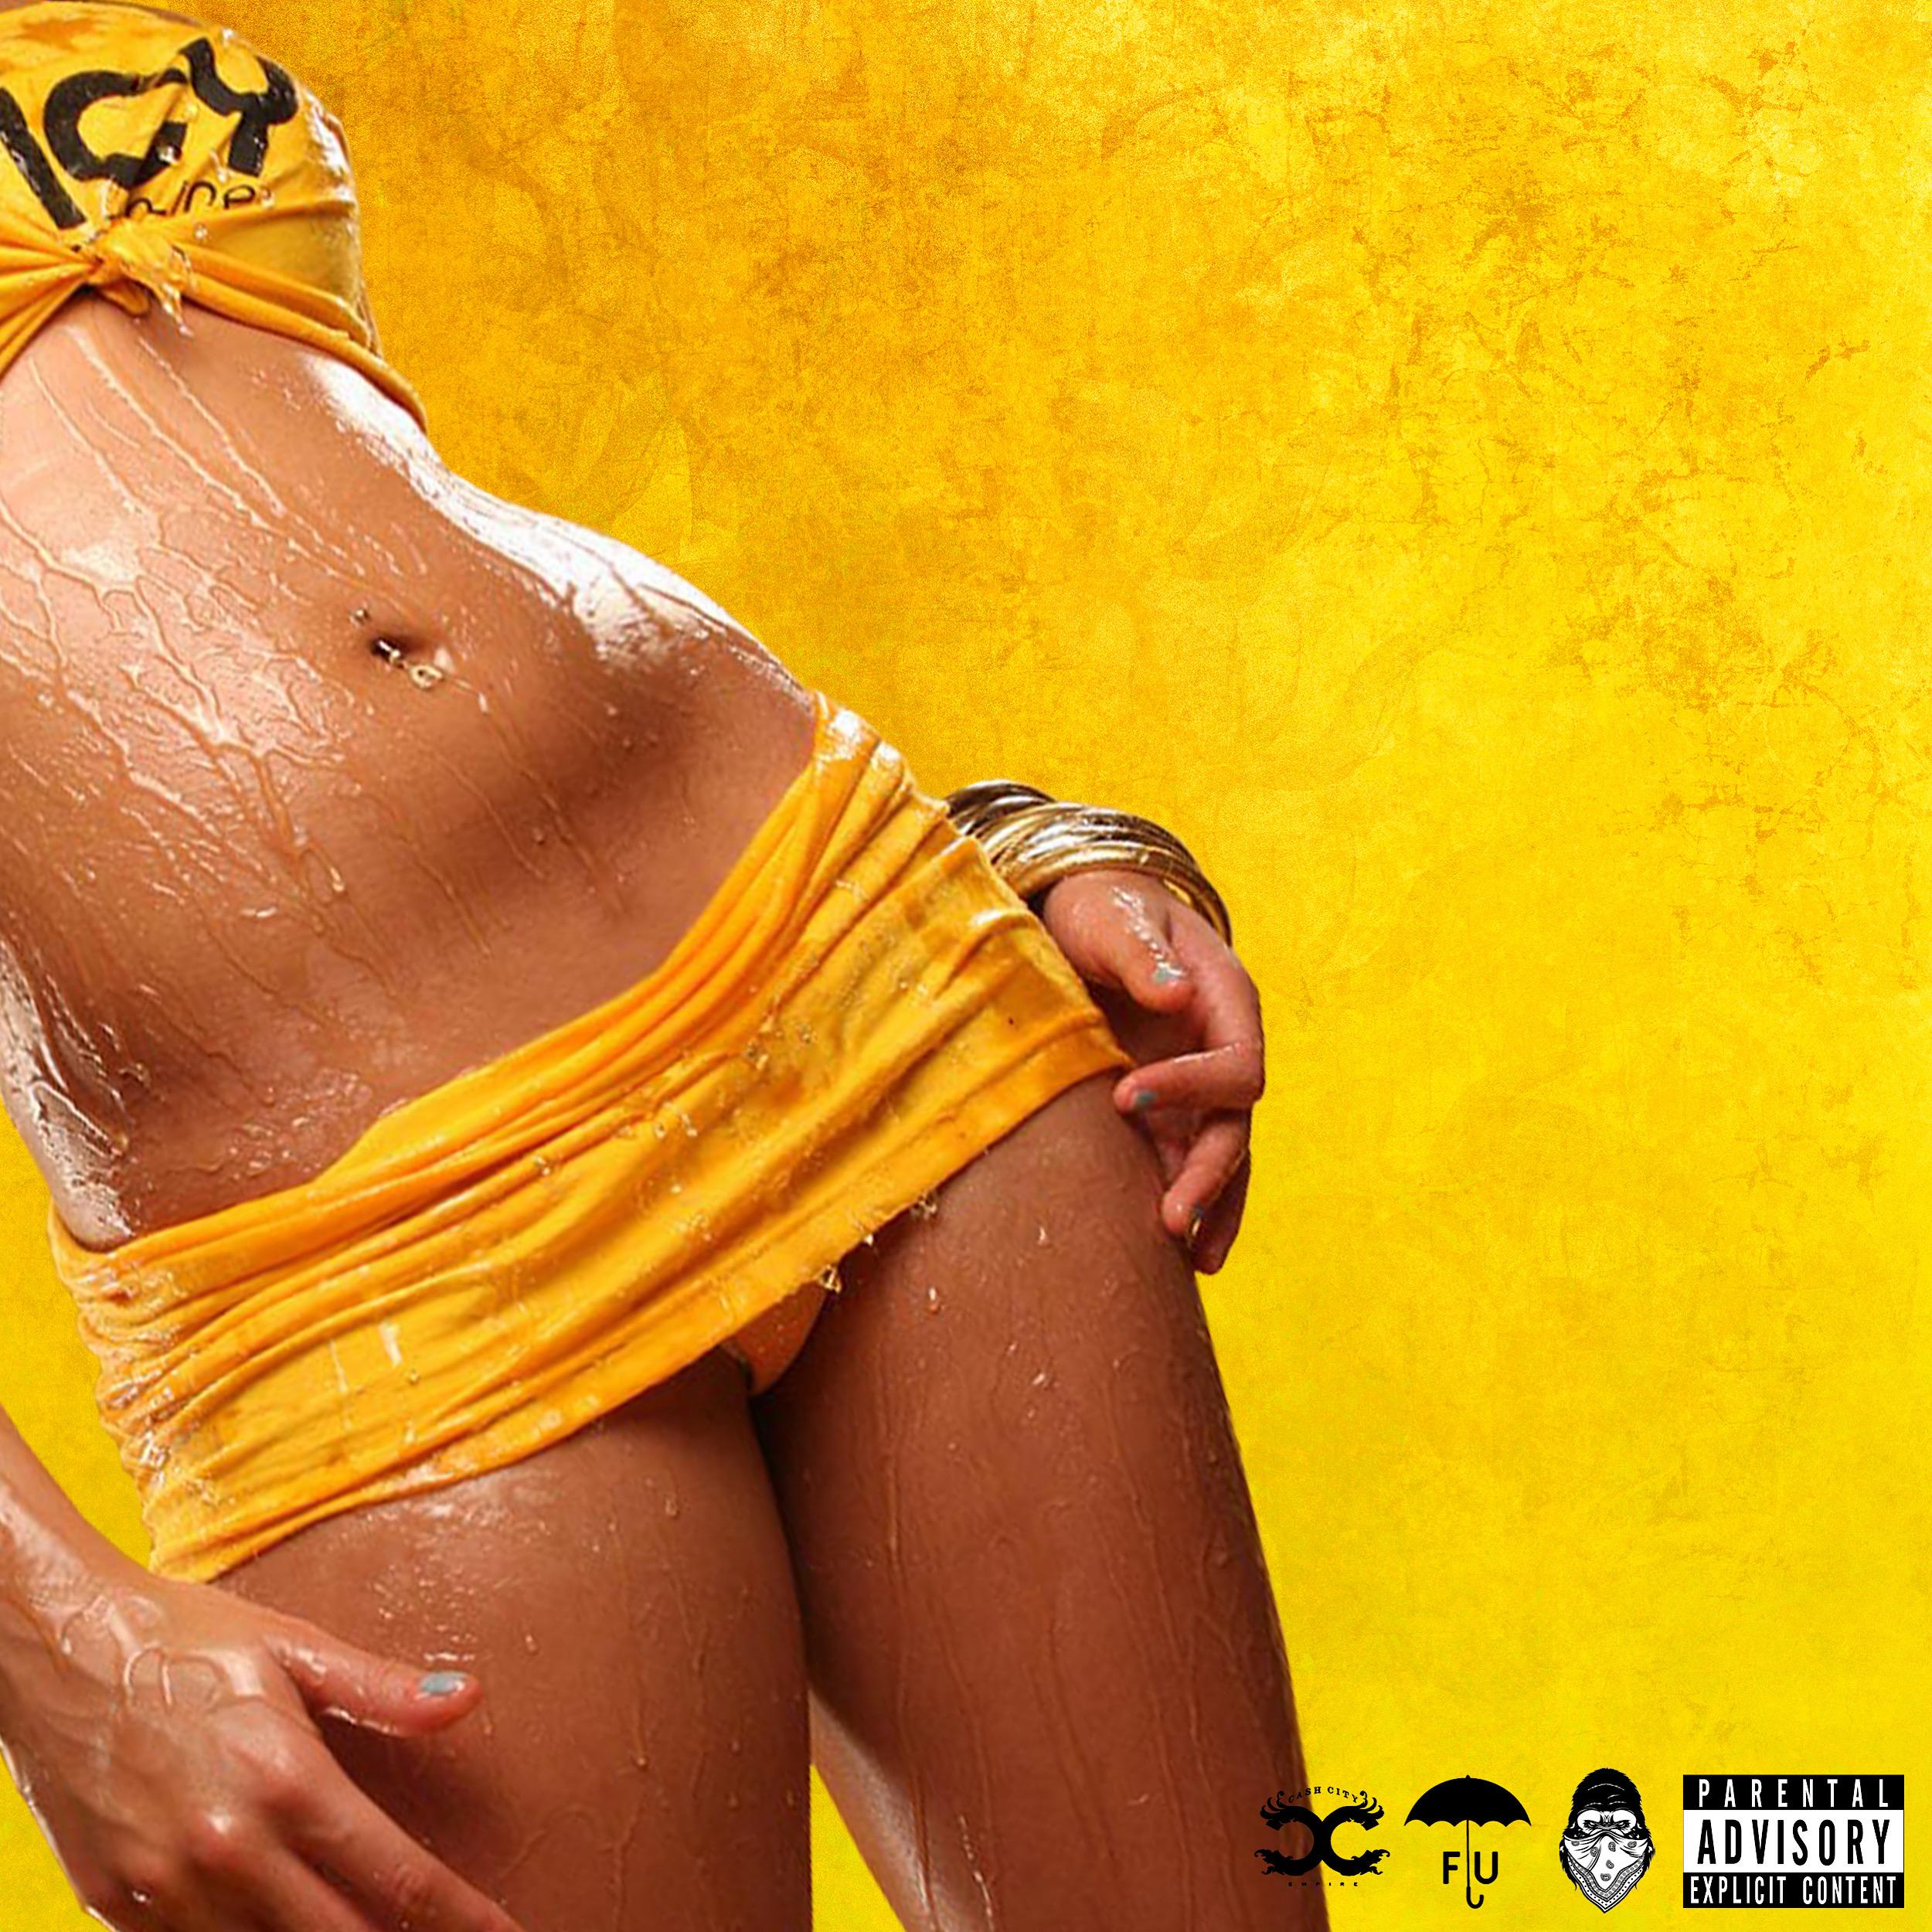 J-HAZE Cuts His Losses On Stern 'Toxic' Anthem